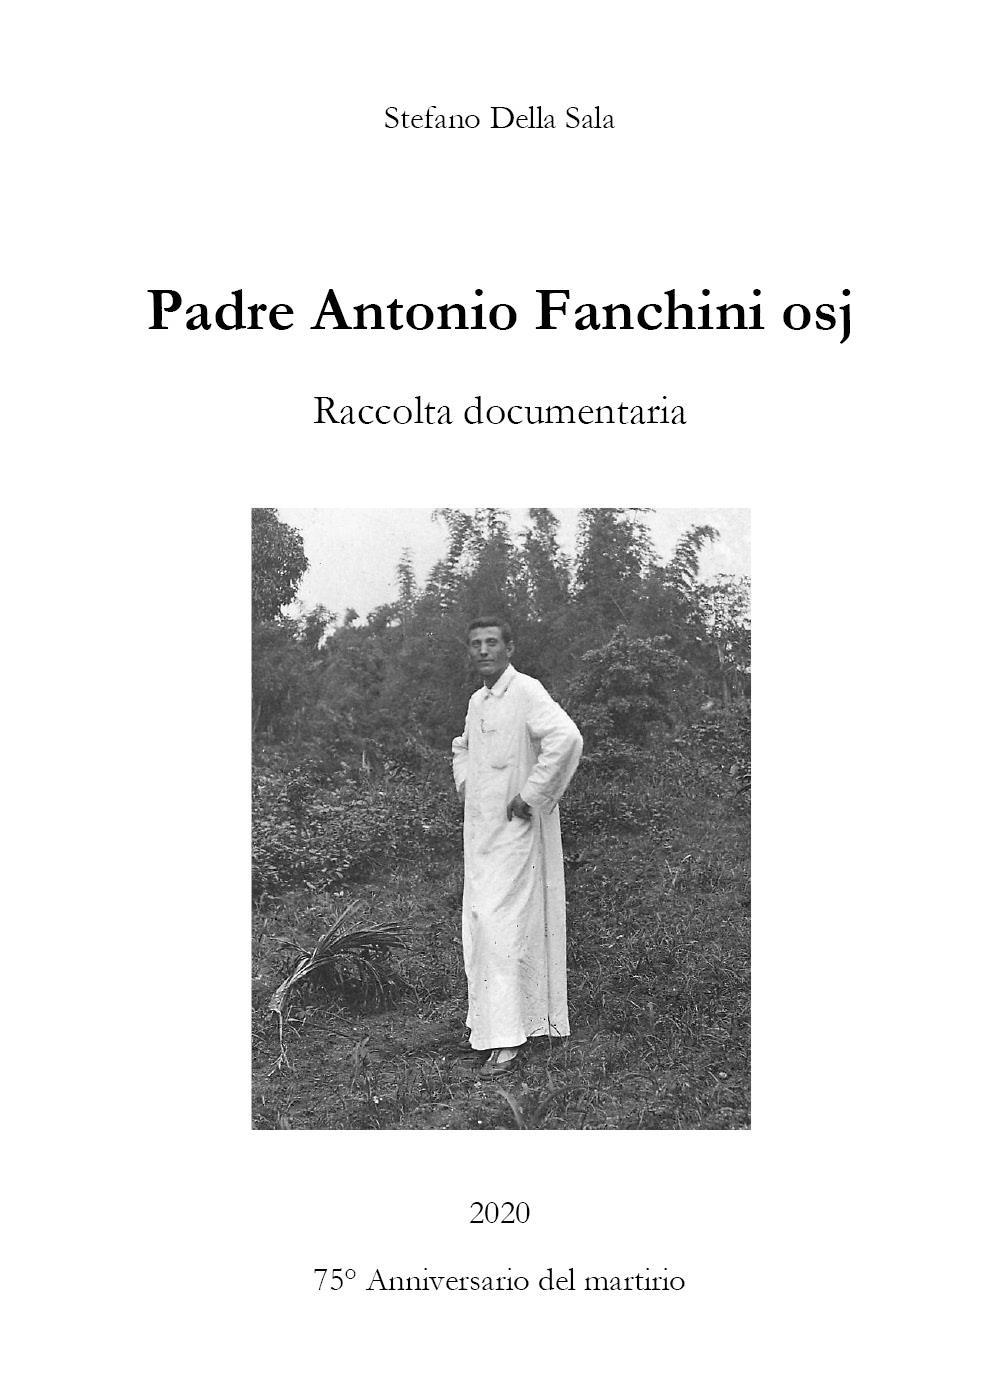 Padre Antonio Fanchini osj. Raccolta documentaria